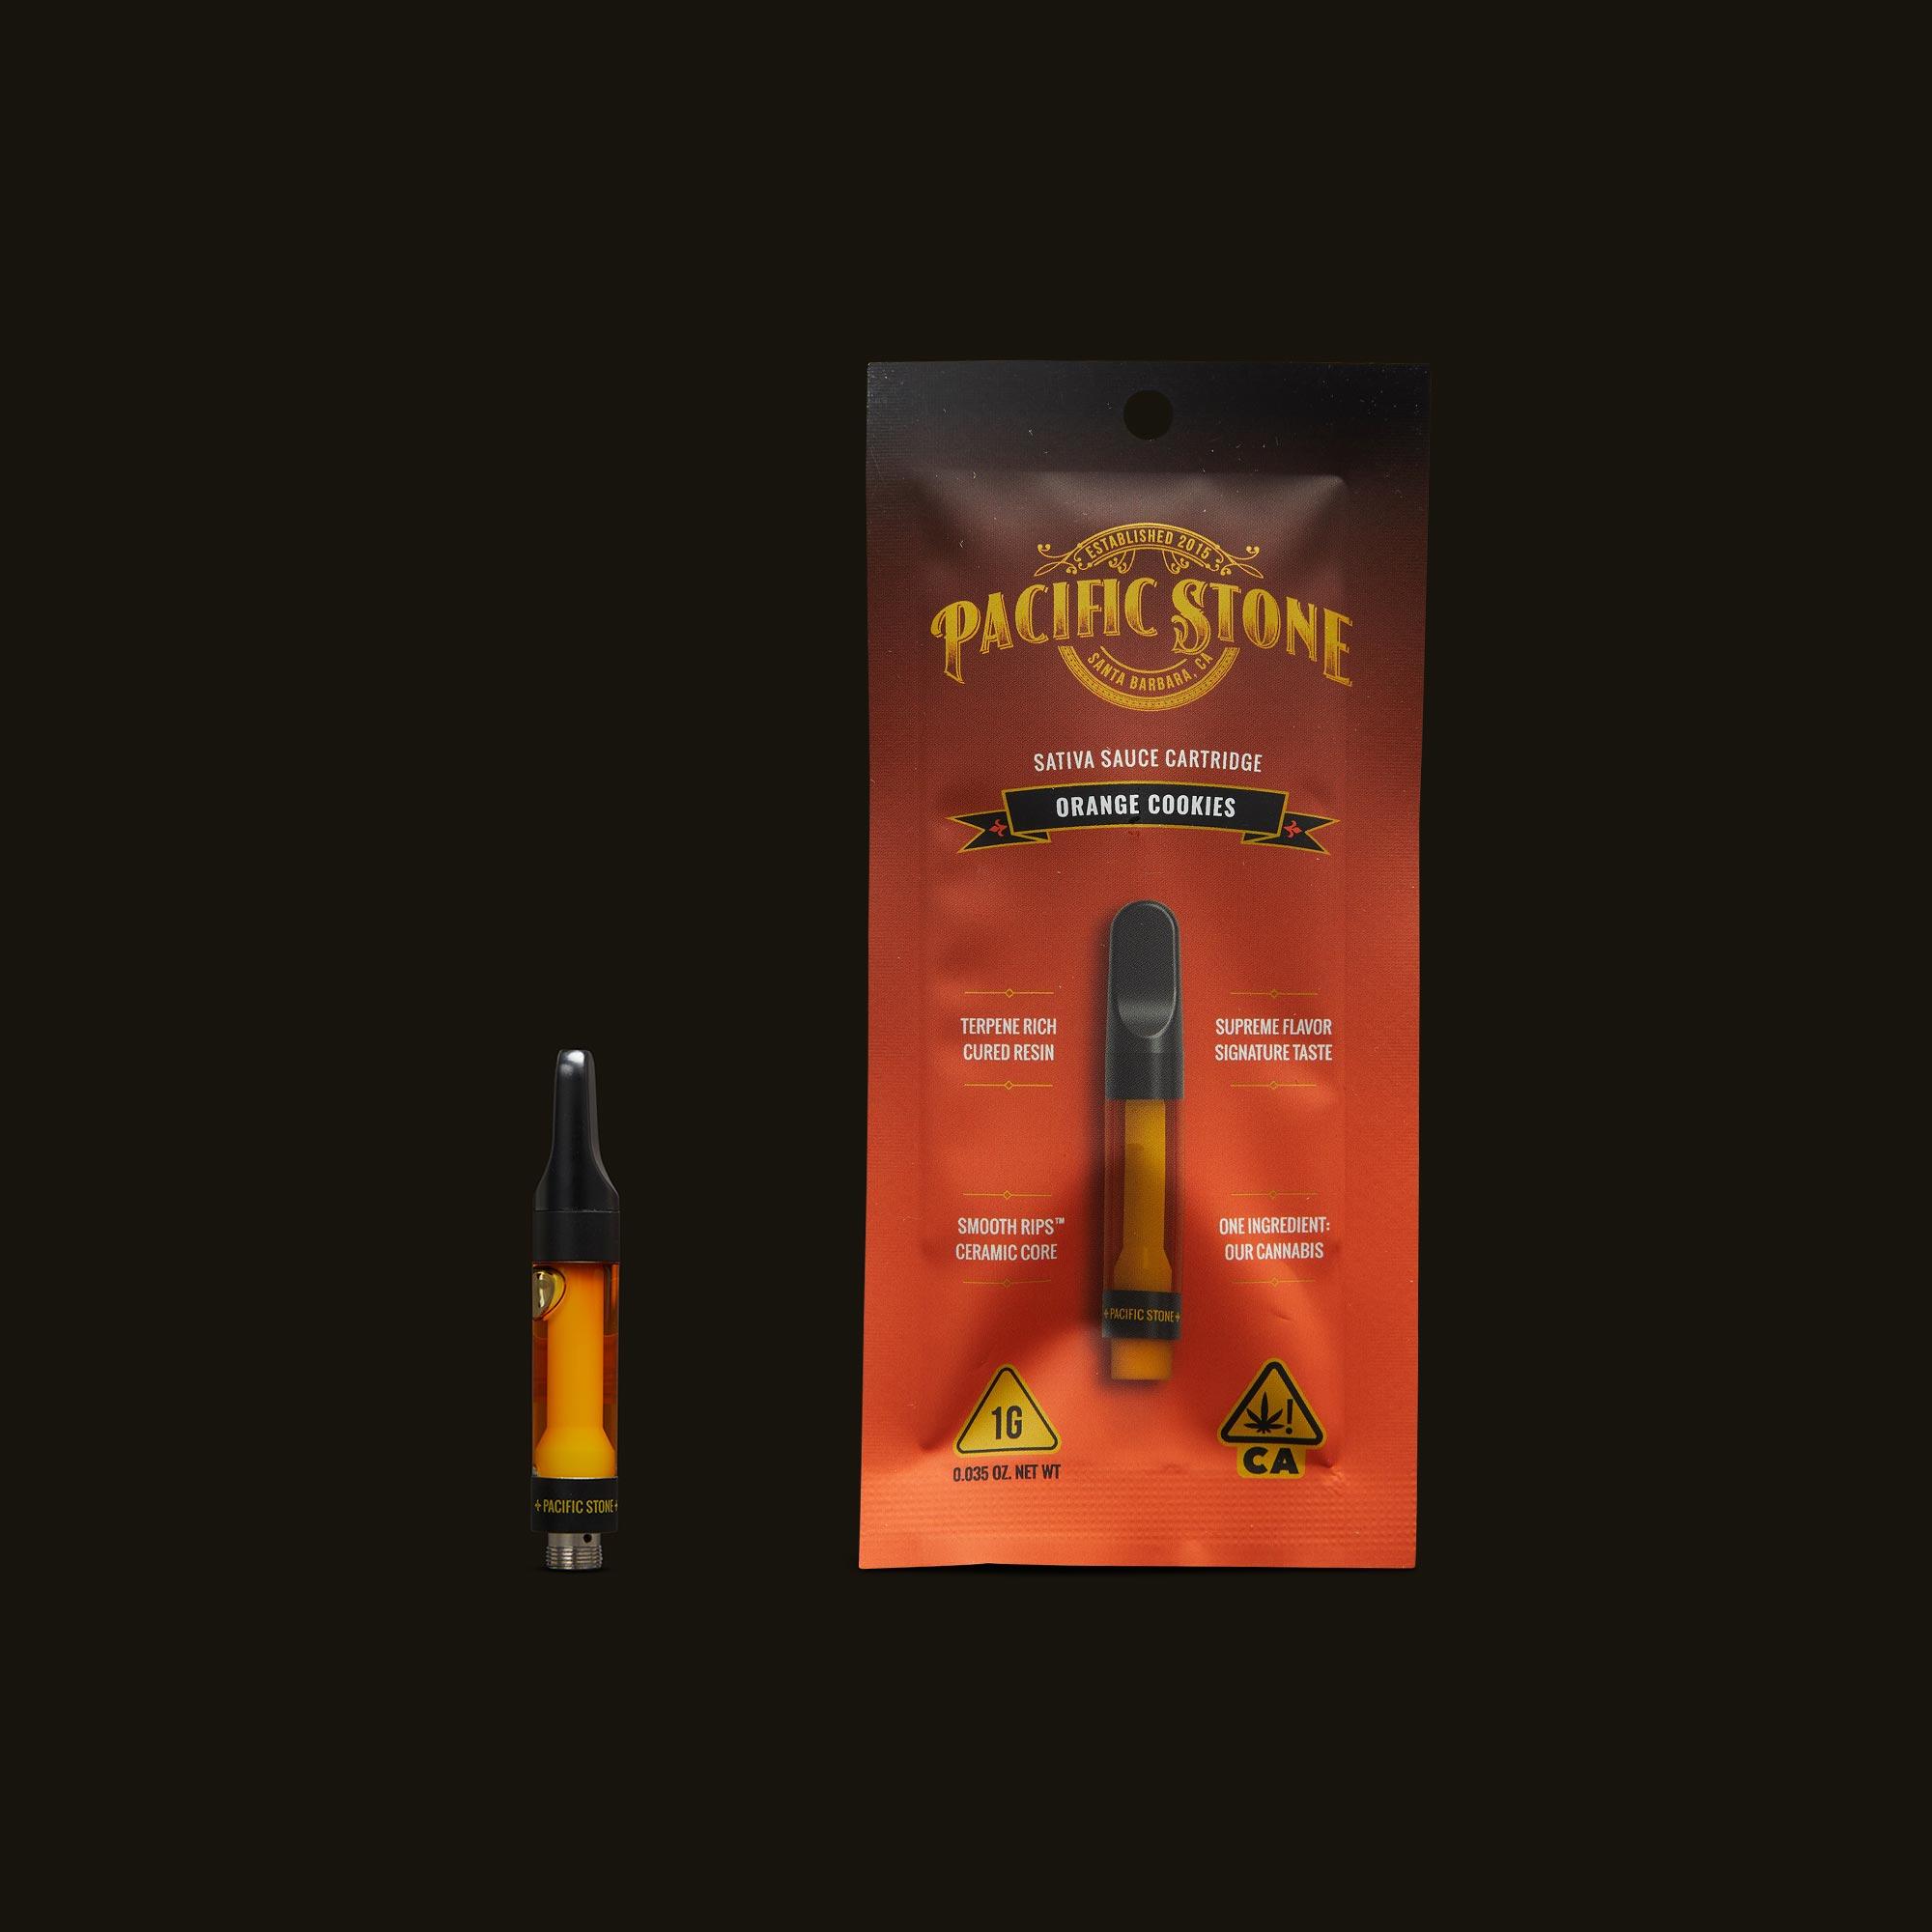 Pacific Stone Orange Cookies Sauce Cartridge